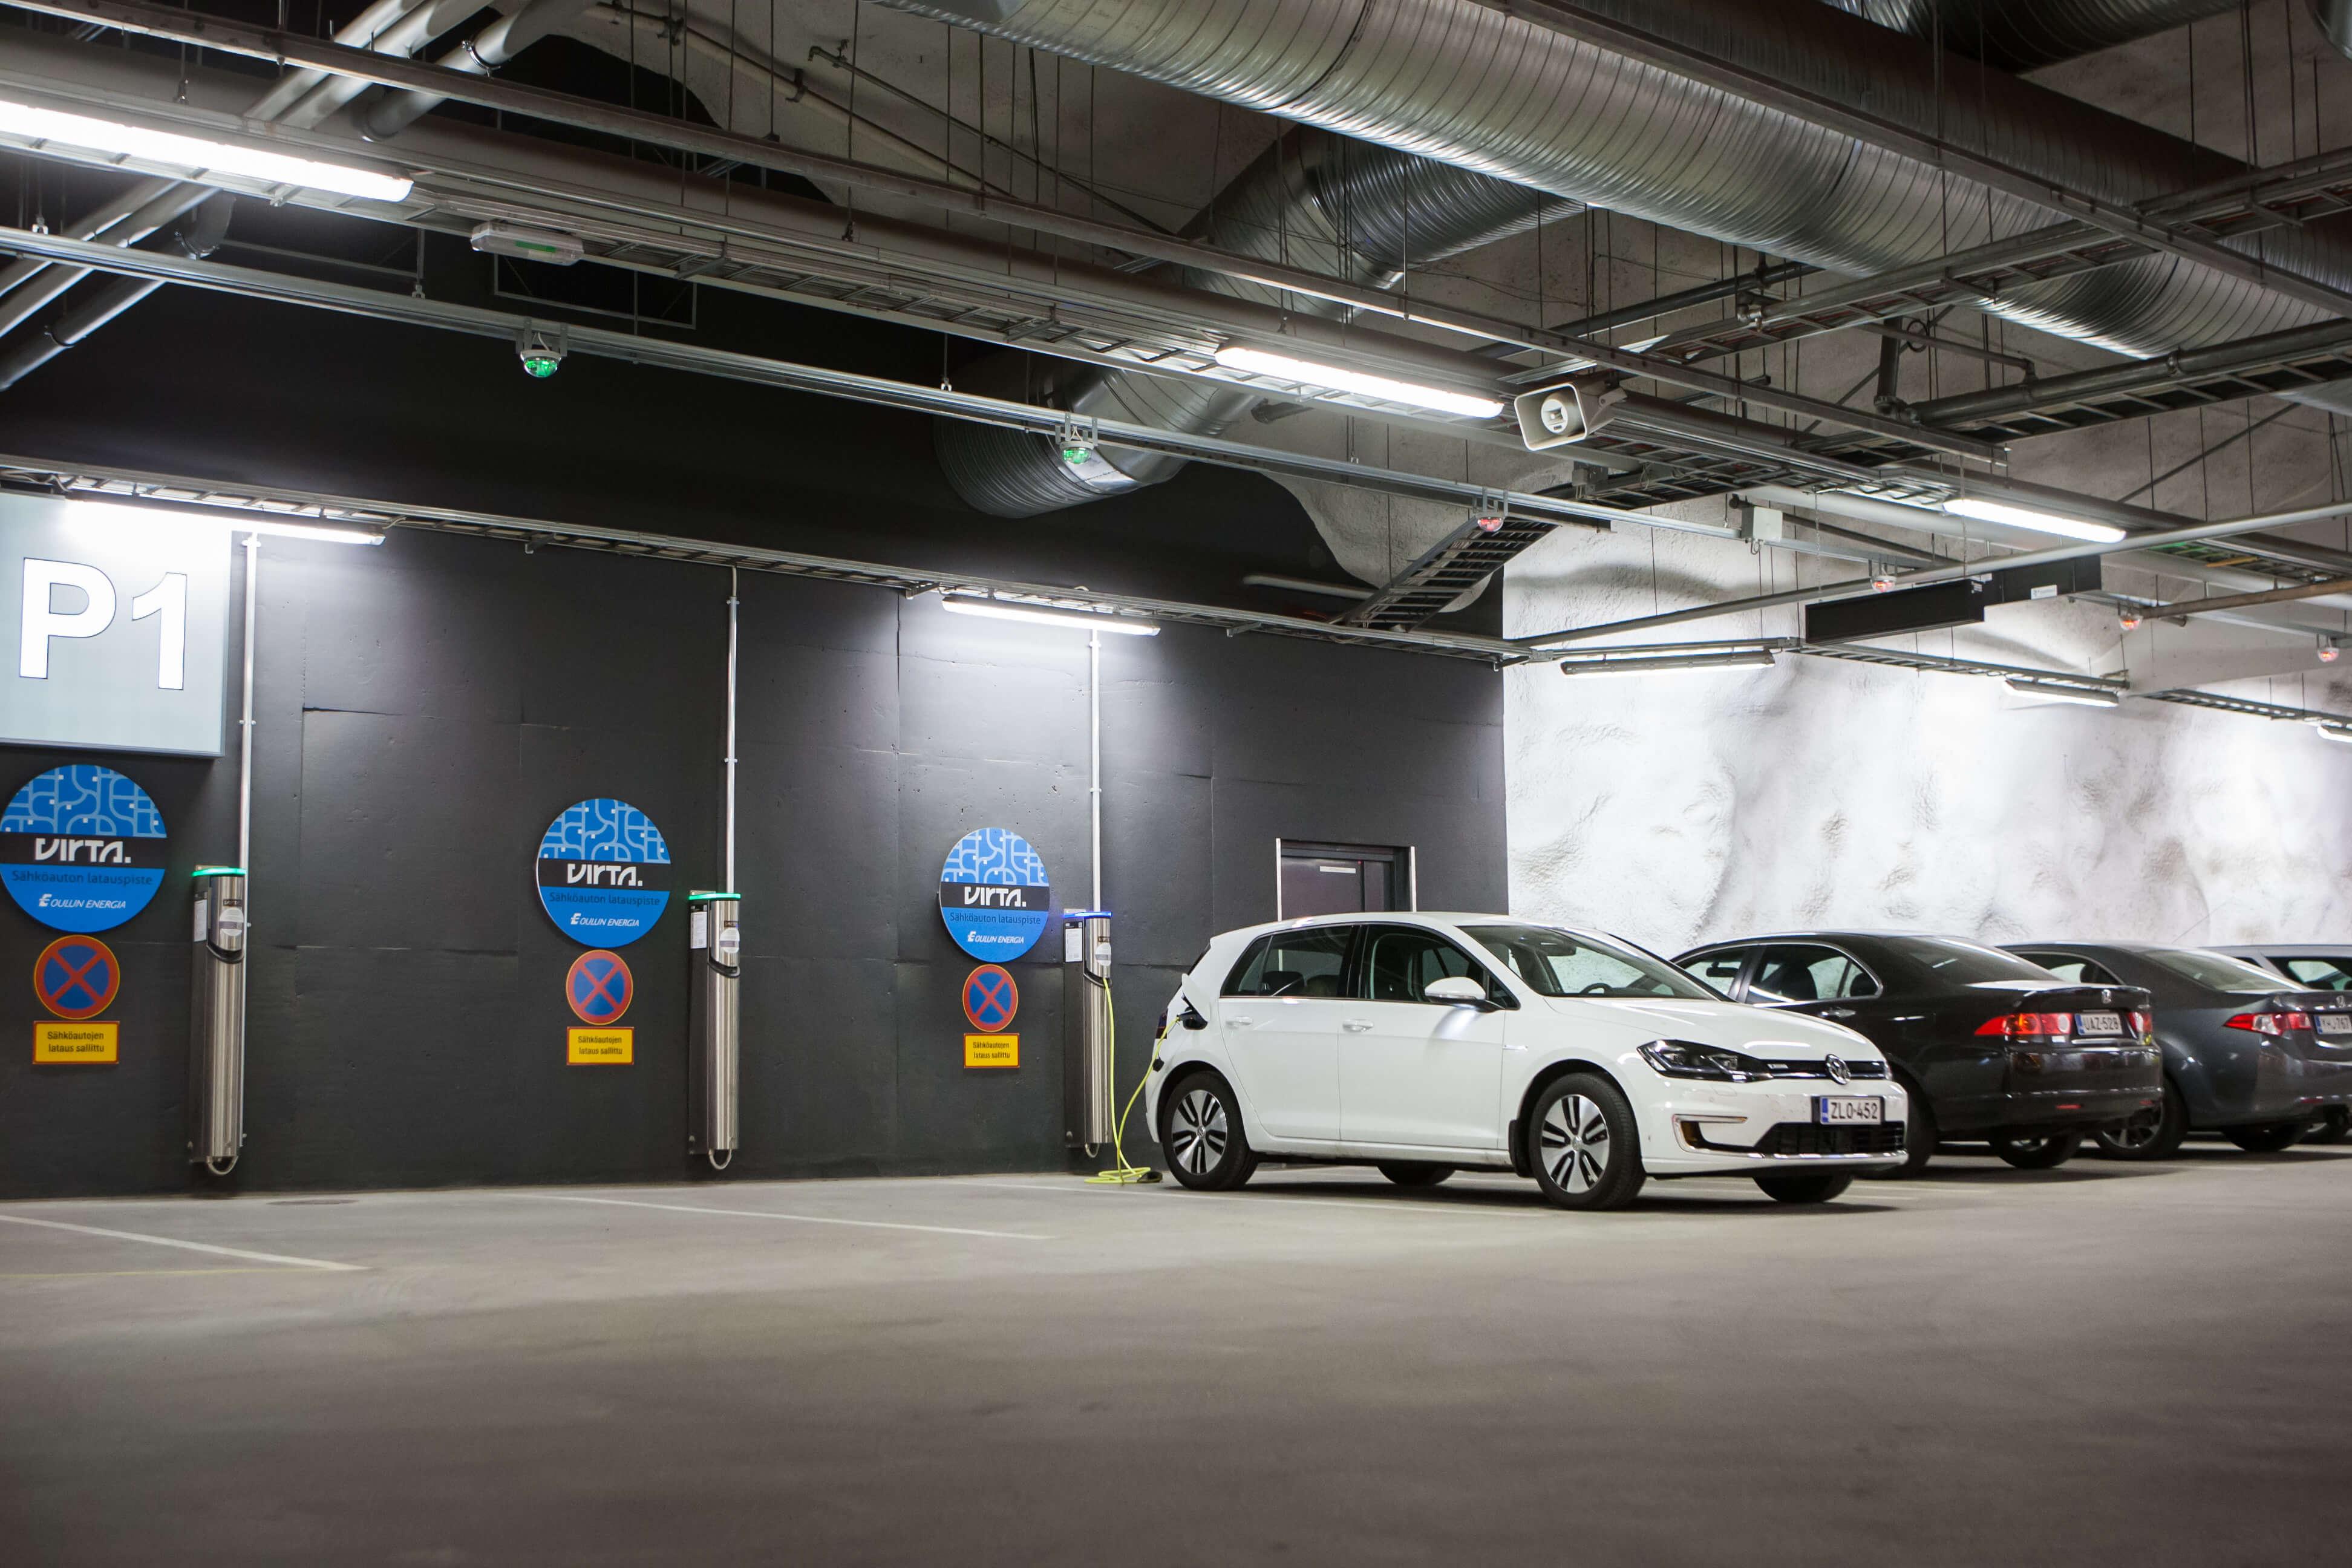 parking_garage_charging_stations